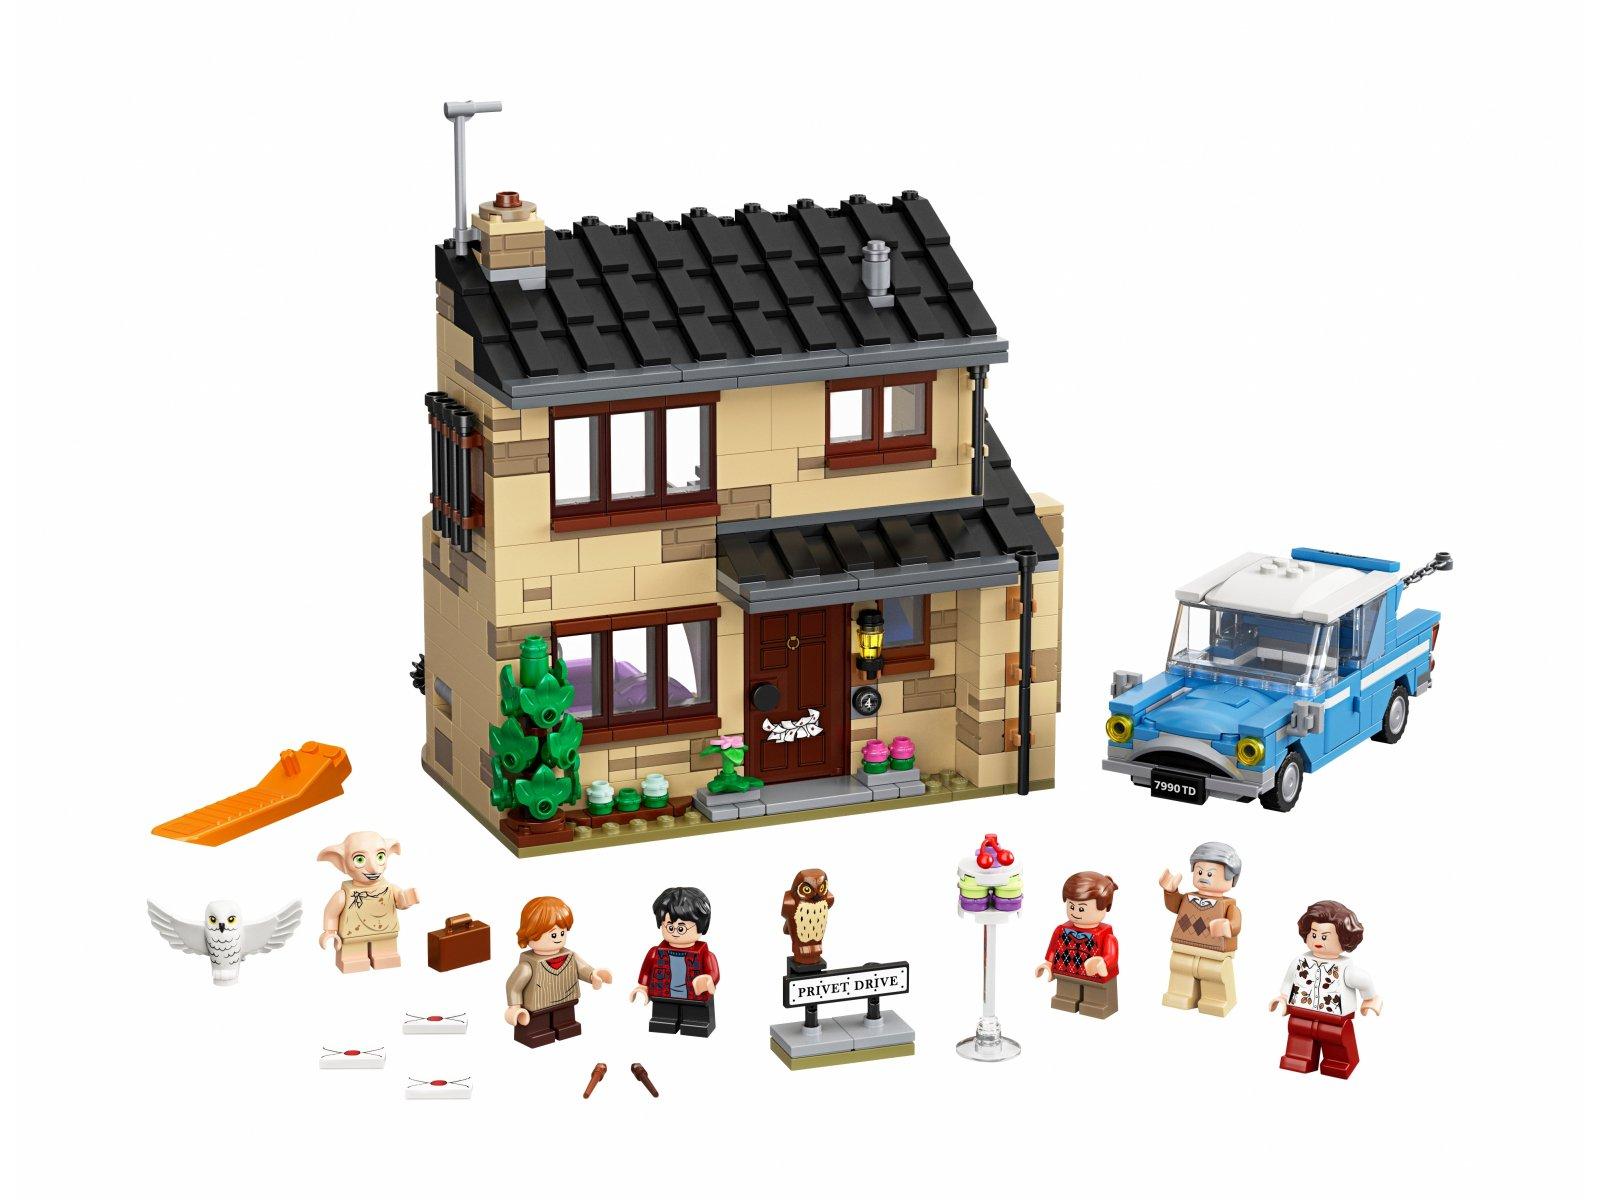 LEGO Harry Potter™ 75968 Privet Drive 4